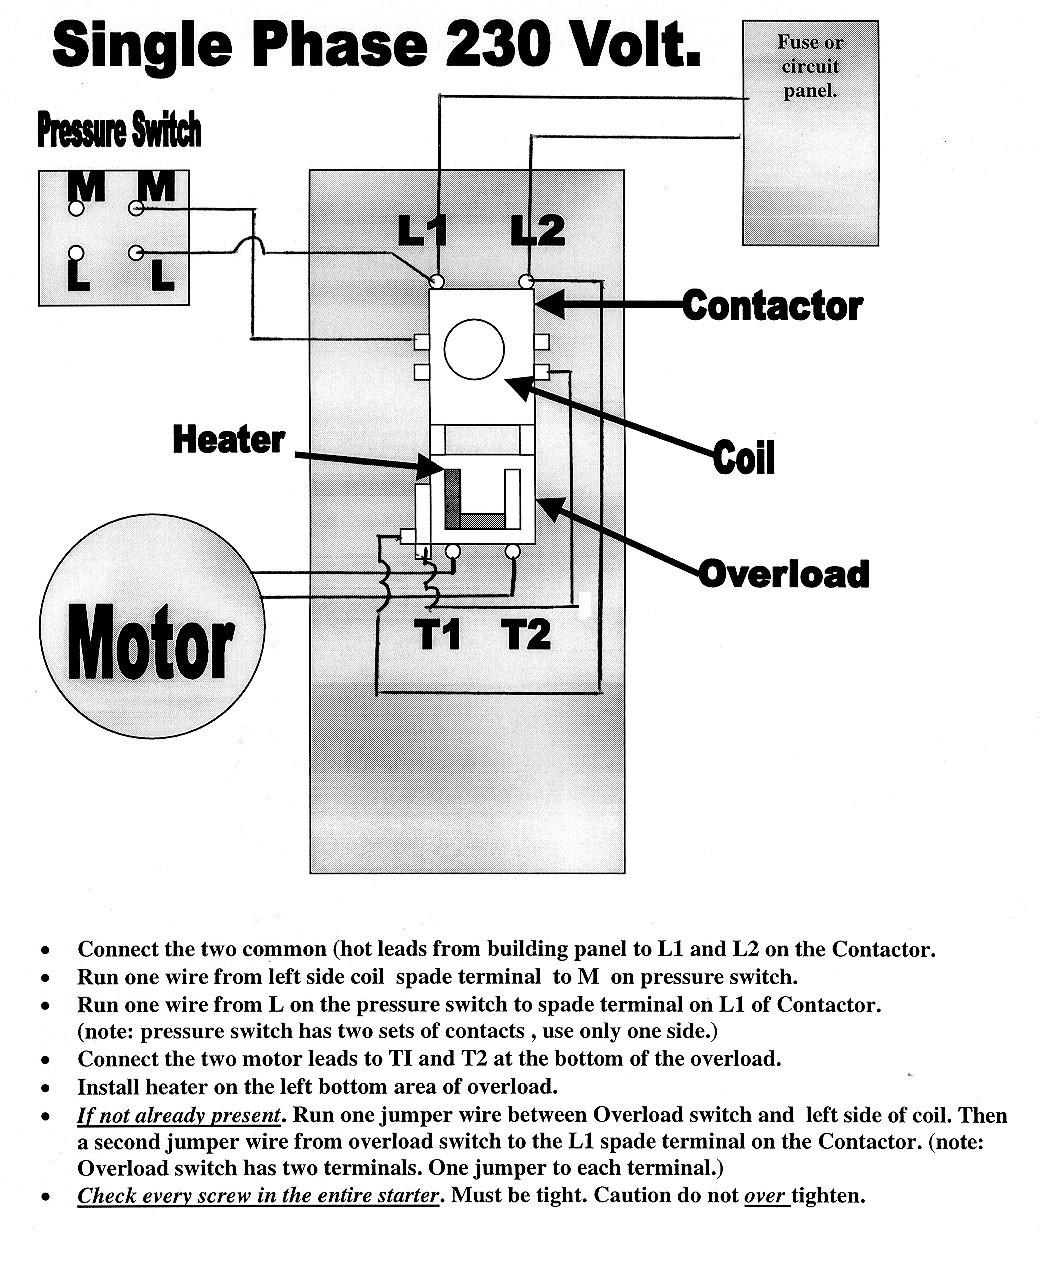 square d wiring diagram 2008 gmc savana radio 2601ag2 gallery